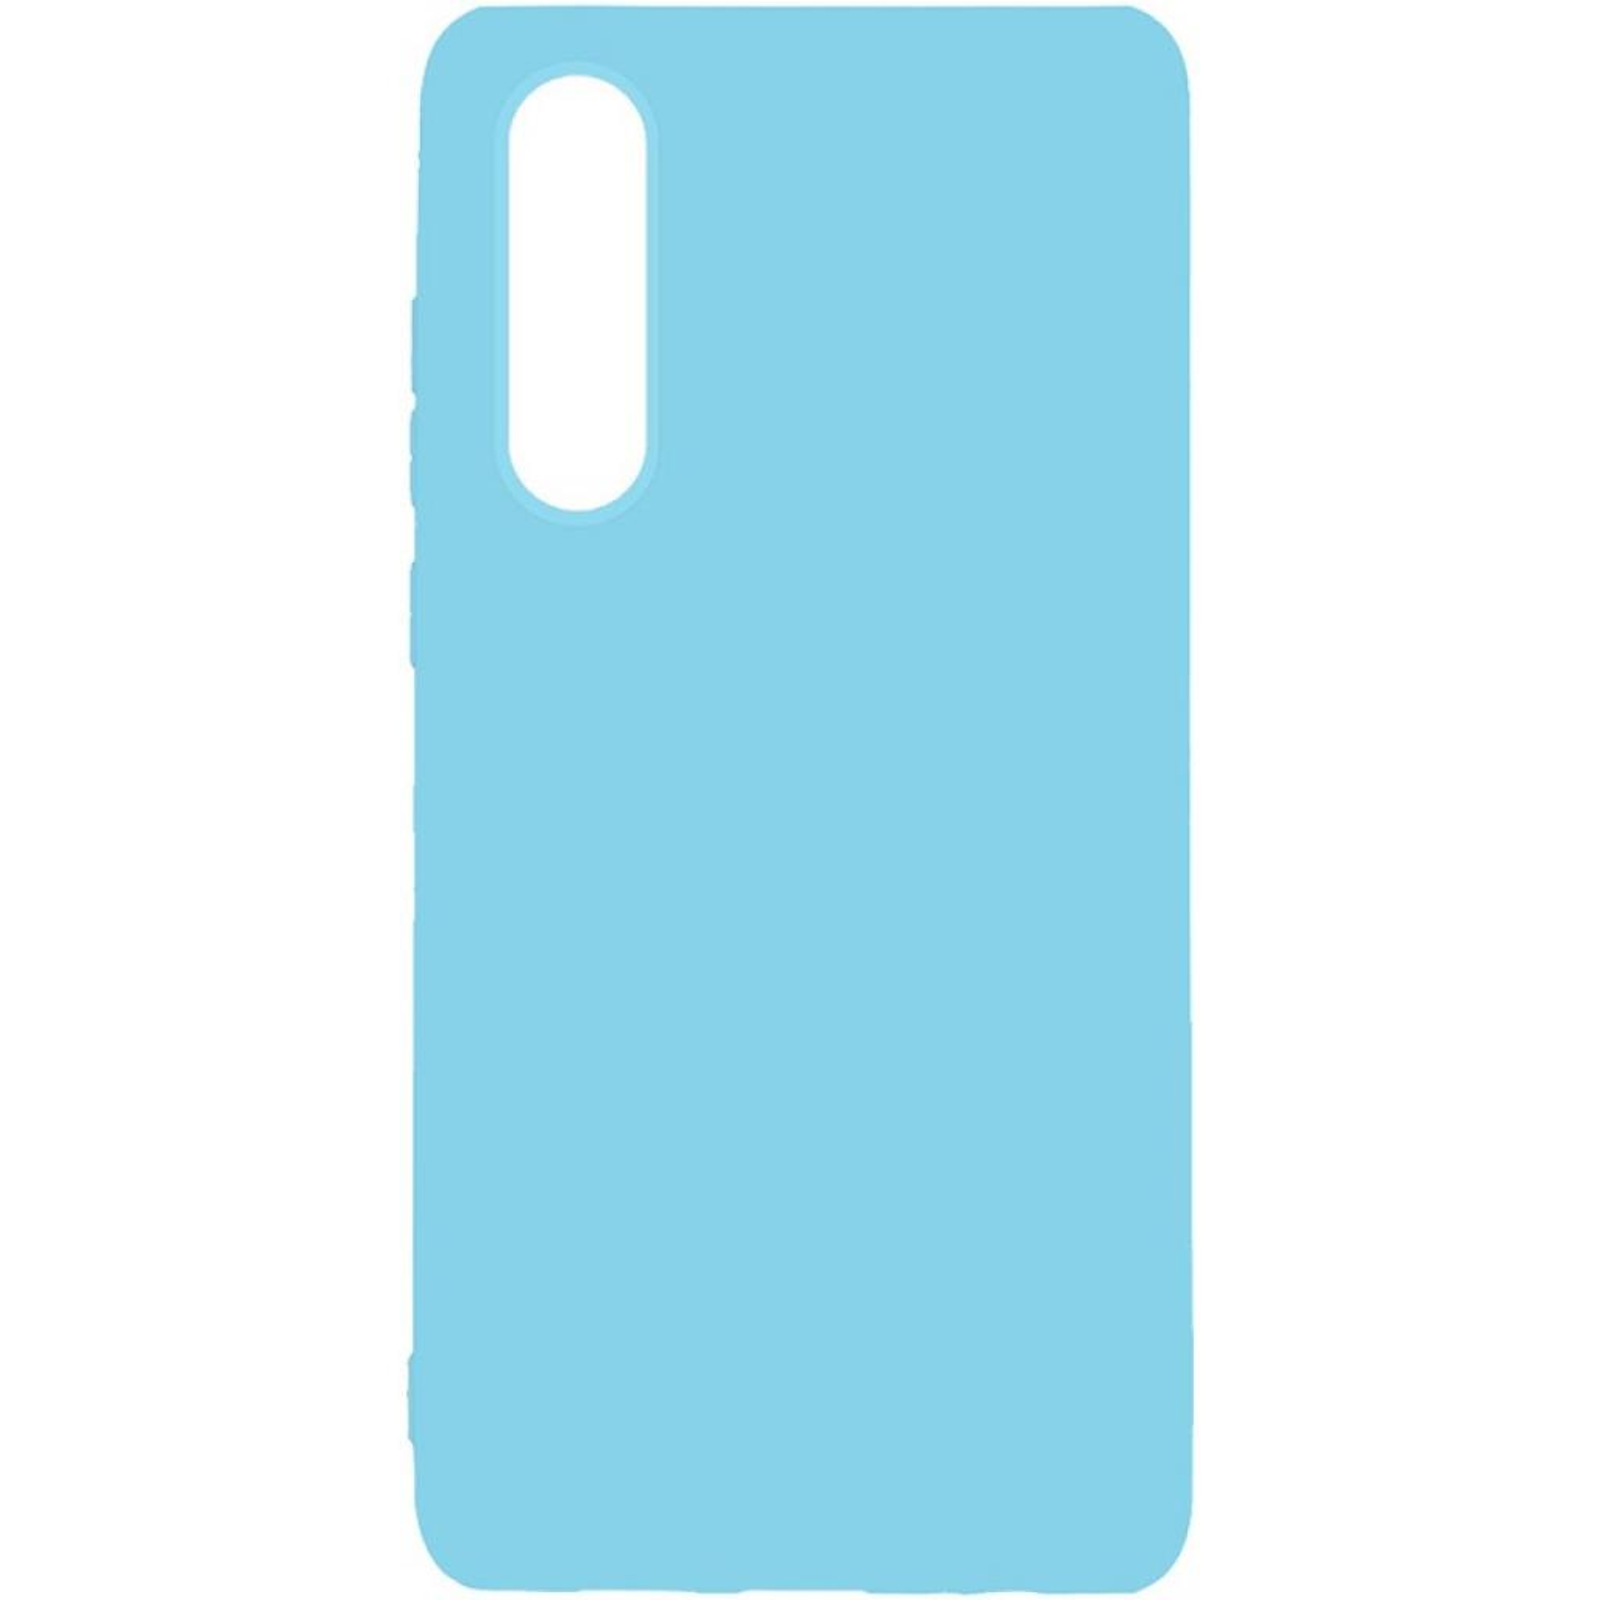 Чехол для моб. телефона Toto 1mm Matt TPU Case Huawei P30 Ocean Blue (F_93982)